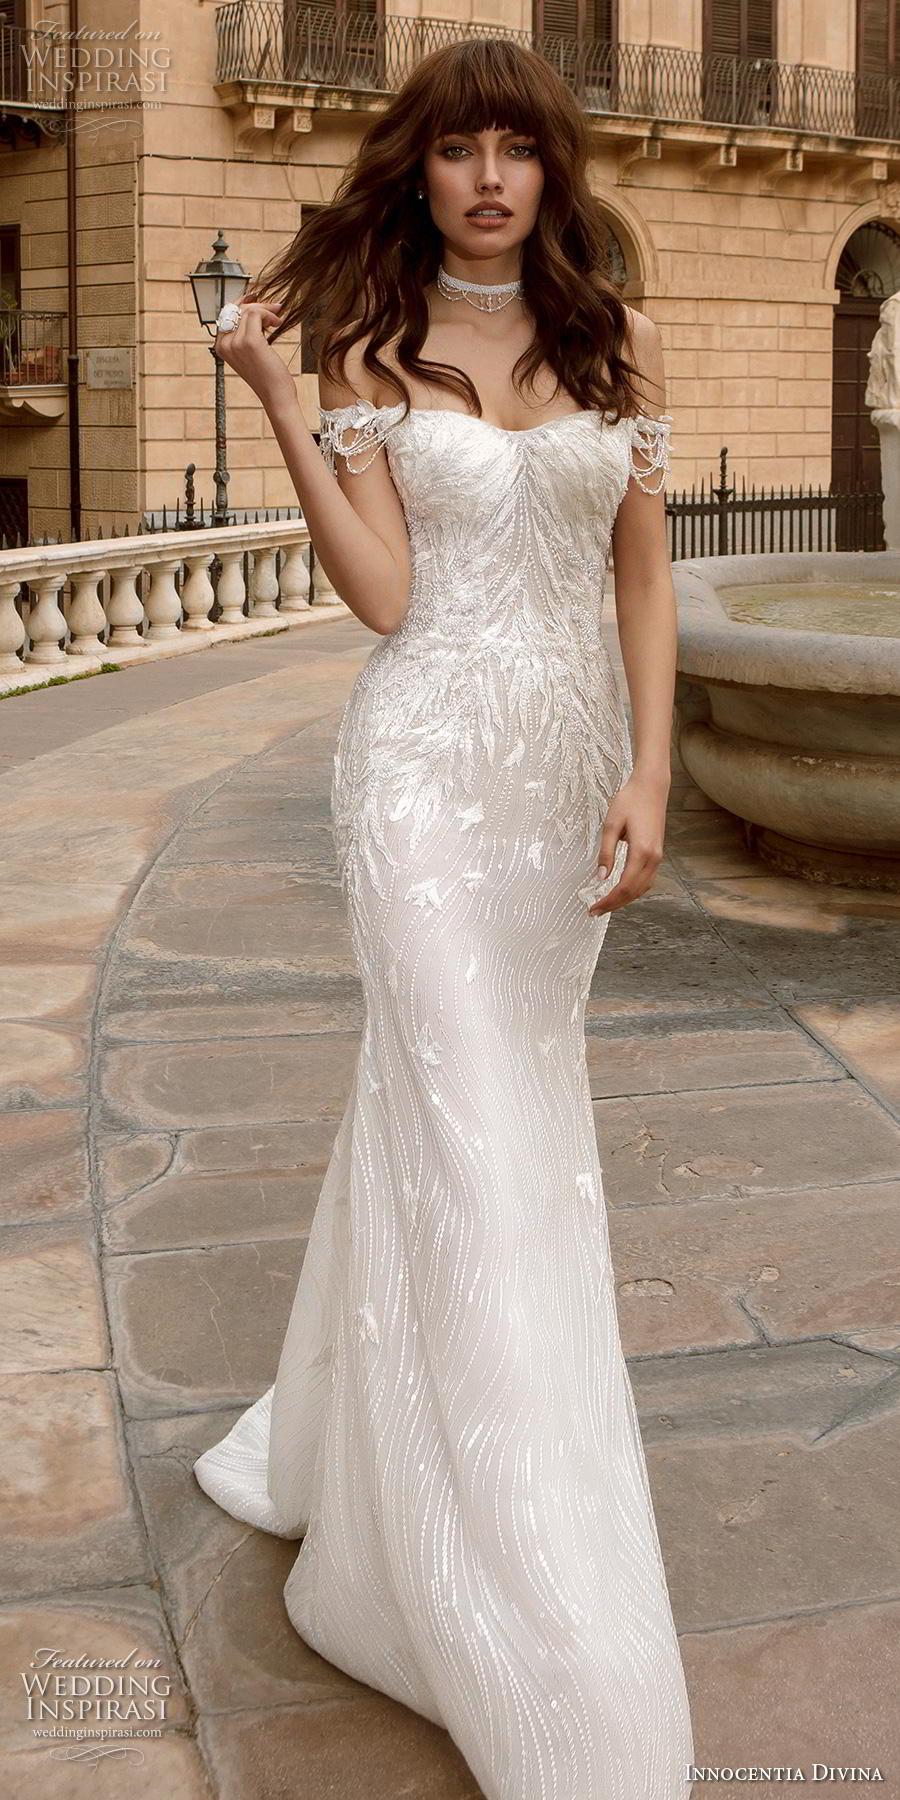 innocentia divina 2020 bridal off the shoulder semi sweetheart neckline elegant sheath wedding dress mid back short train (8) mv